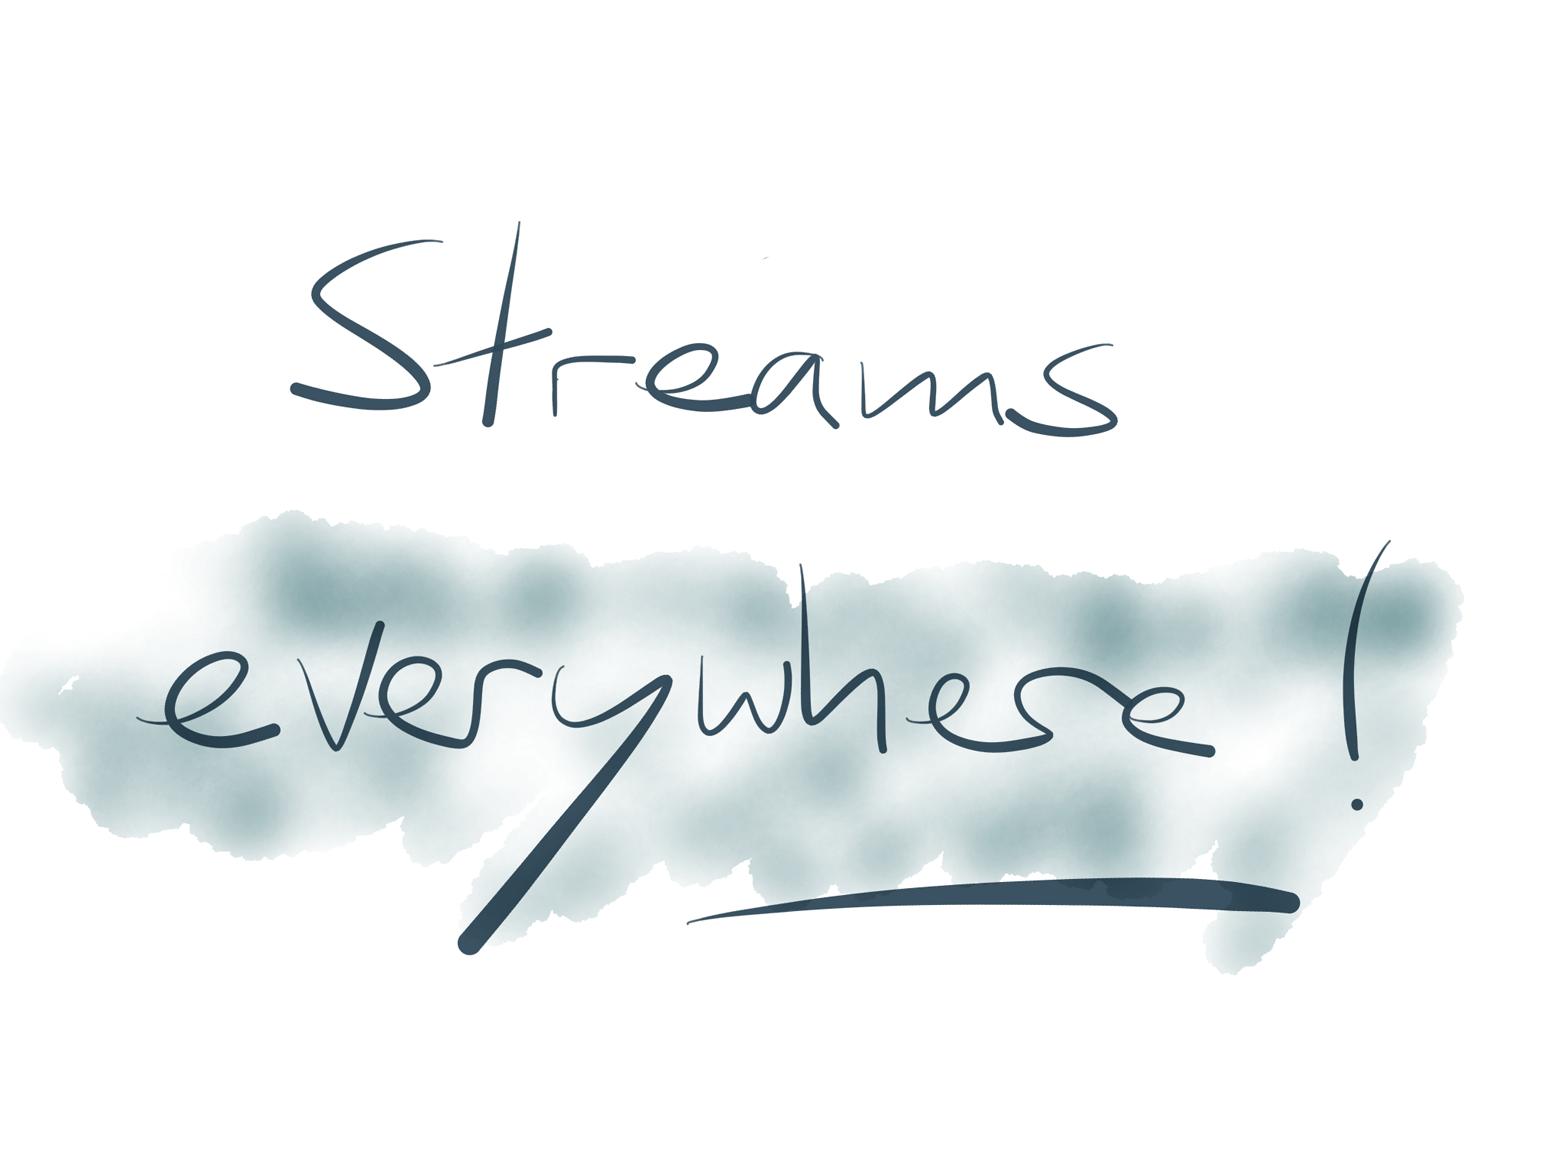 Event streams are a splendid idea. We should put them everywhere.